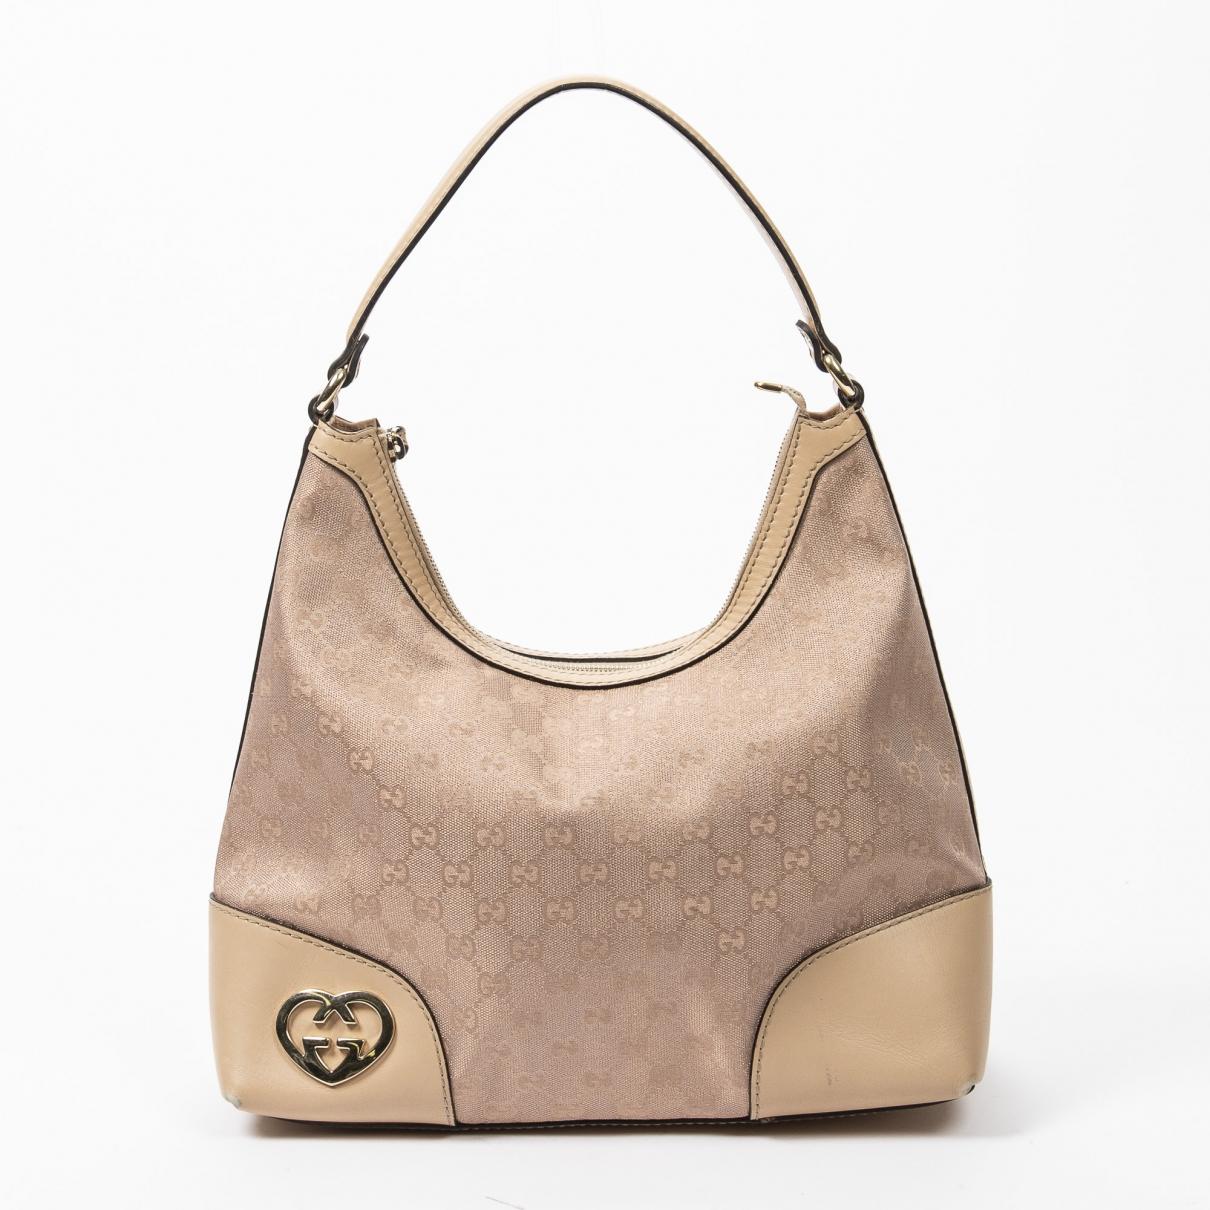 Gucci - Sac a main Interlocking pour femme en coton - marron